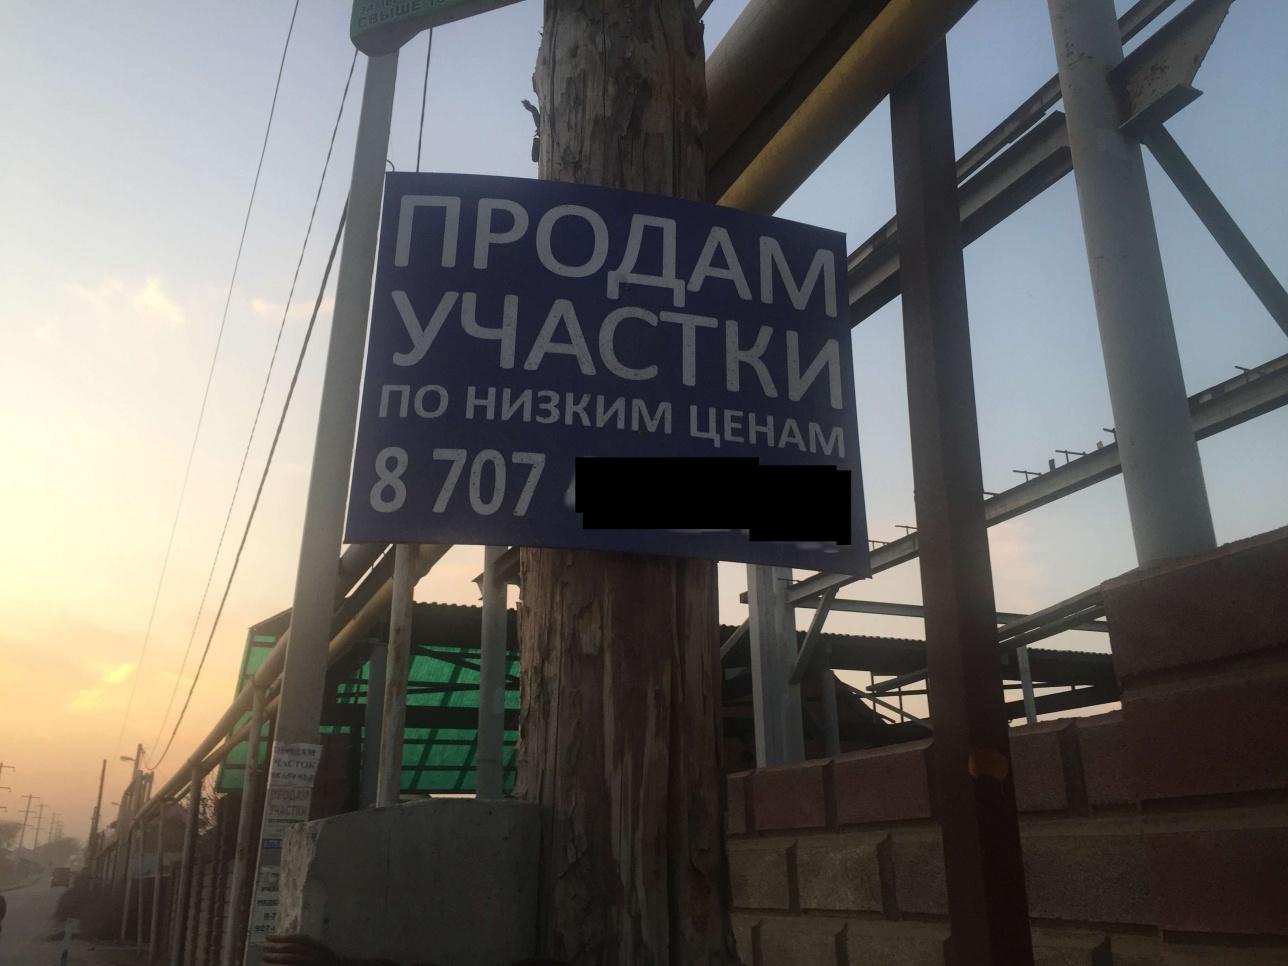 Объявление в микрорайоне Кемерторган